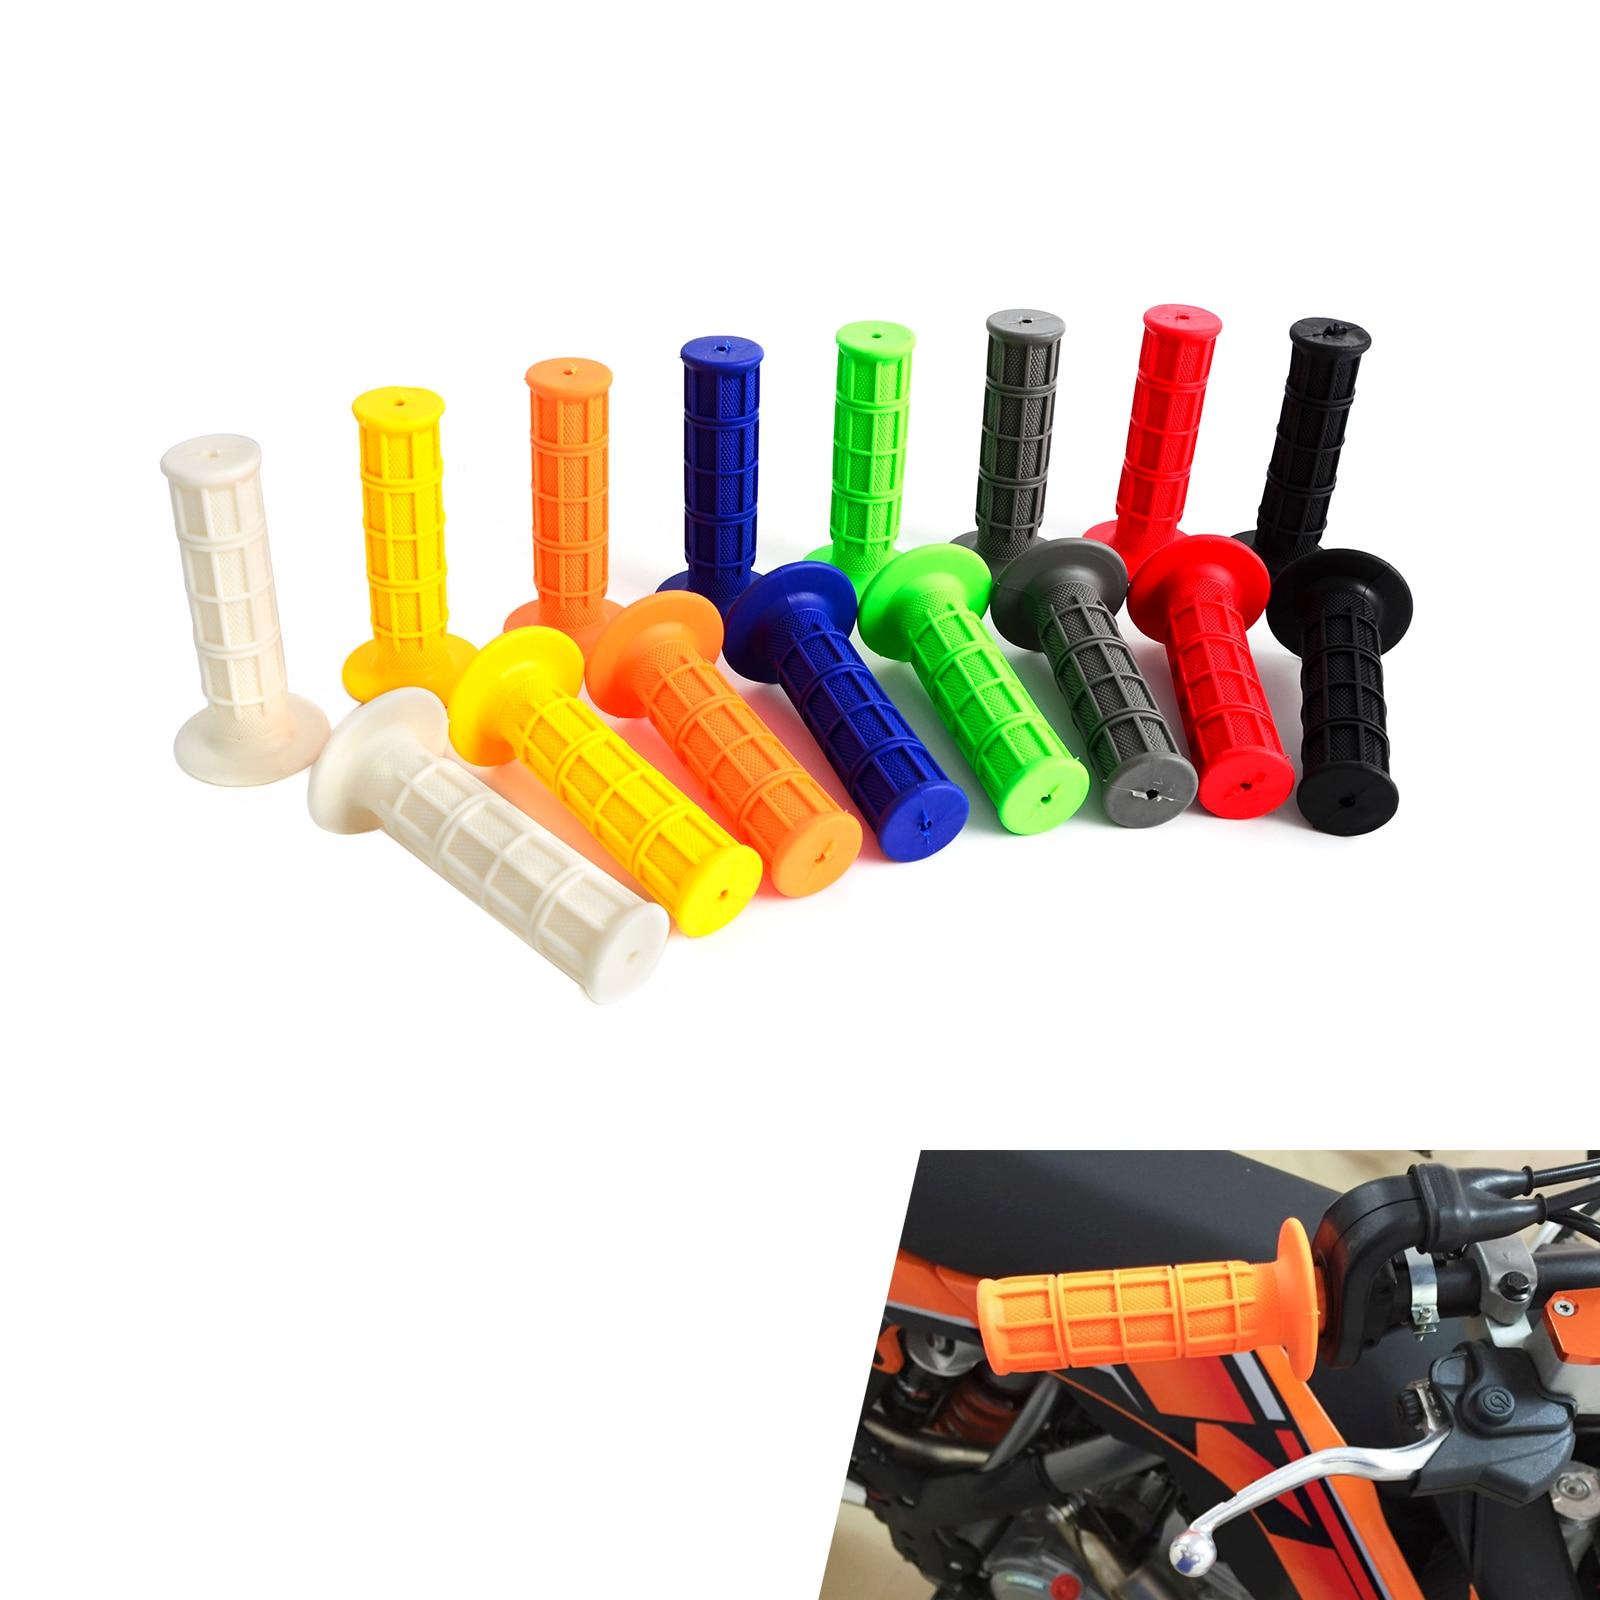 Rubber HandleBar Grip For CR CRF XR YZ WR TTR KX KLX KTM RMZ RMX RM TC TE FC FE ATV Enduro Motocross Pit Dirt Bike Off Road